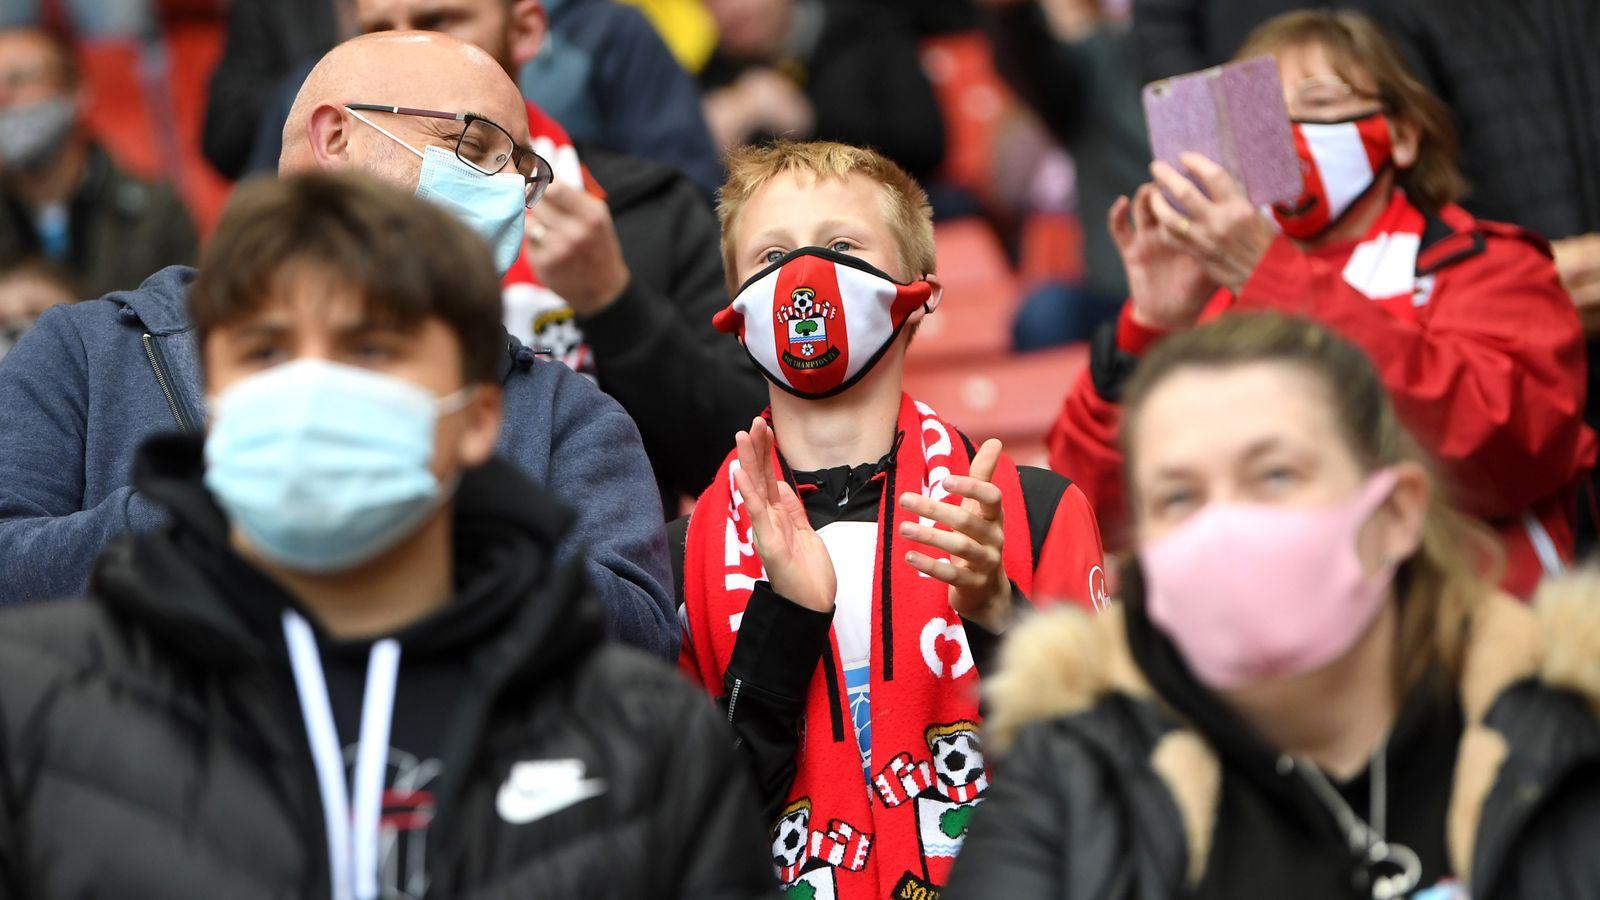 Premier League still considering Covid-19 certification at stadiums next season